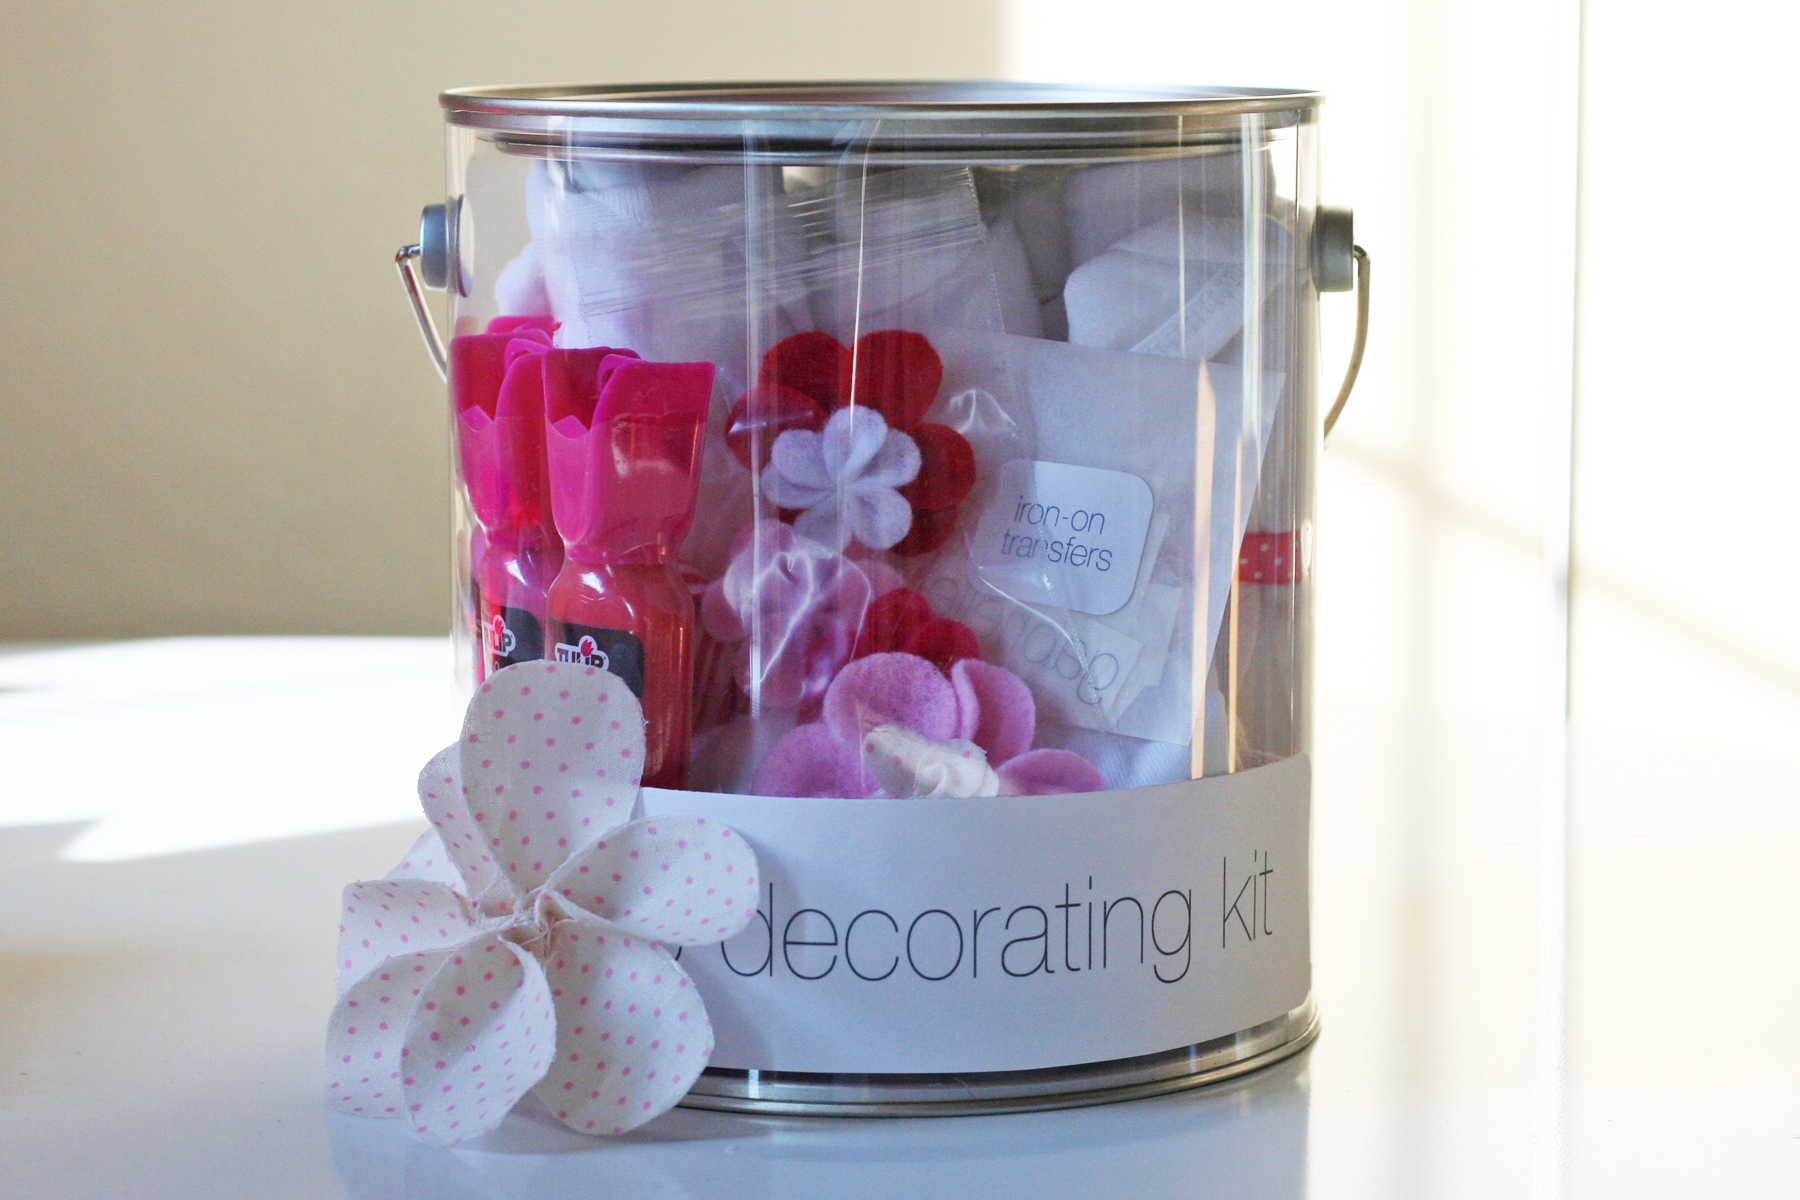 gift idea onesie decorating kit warm hot chocolate